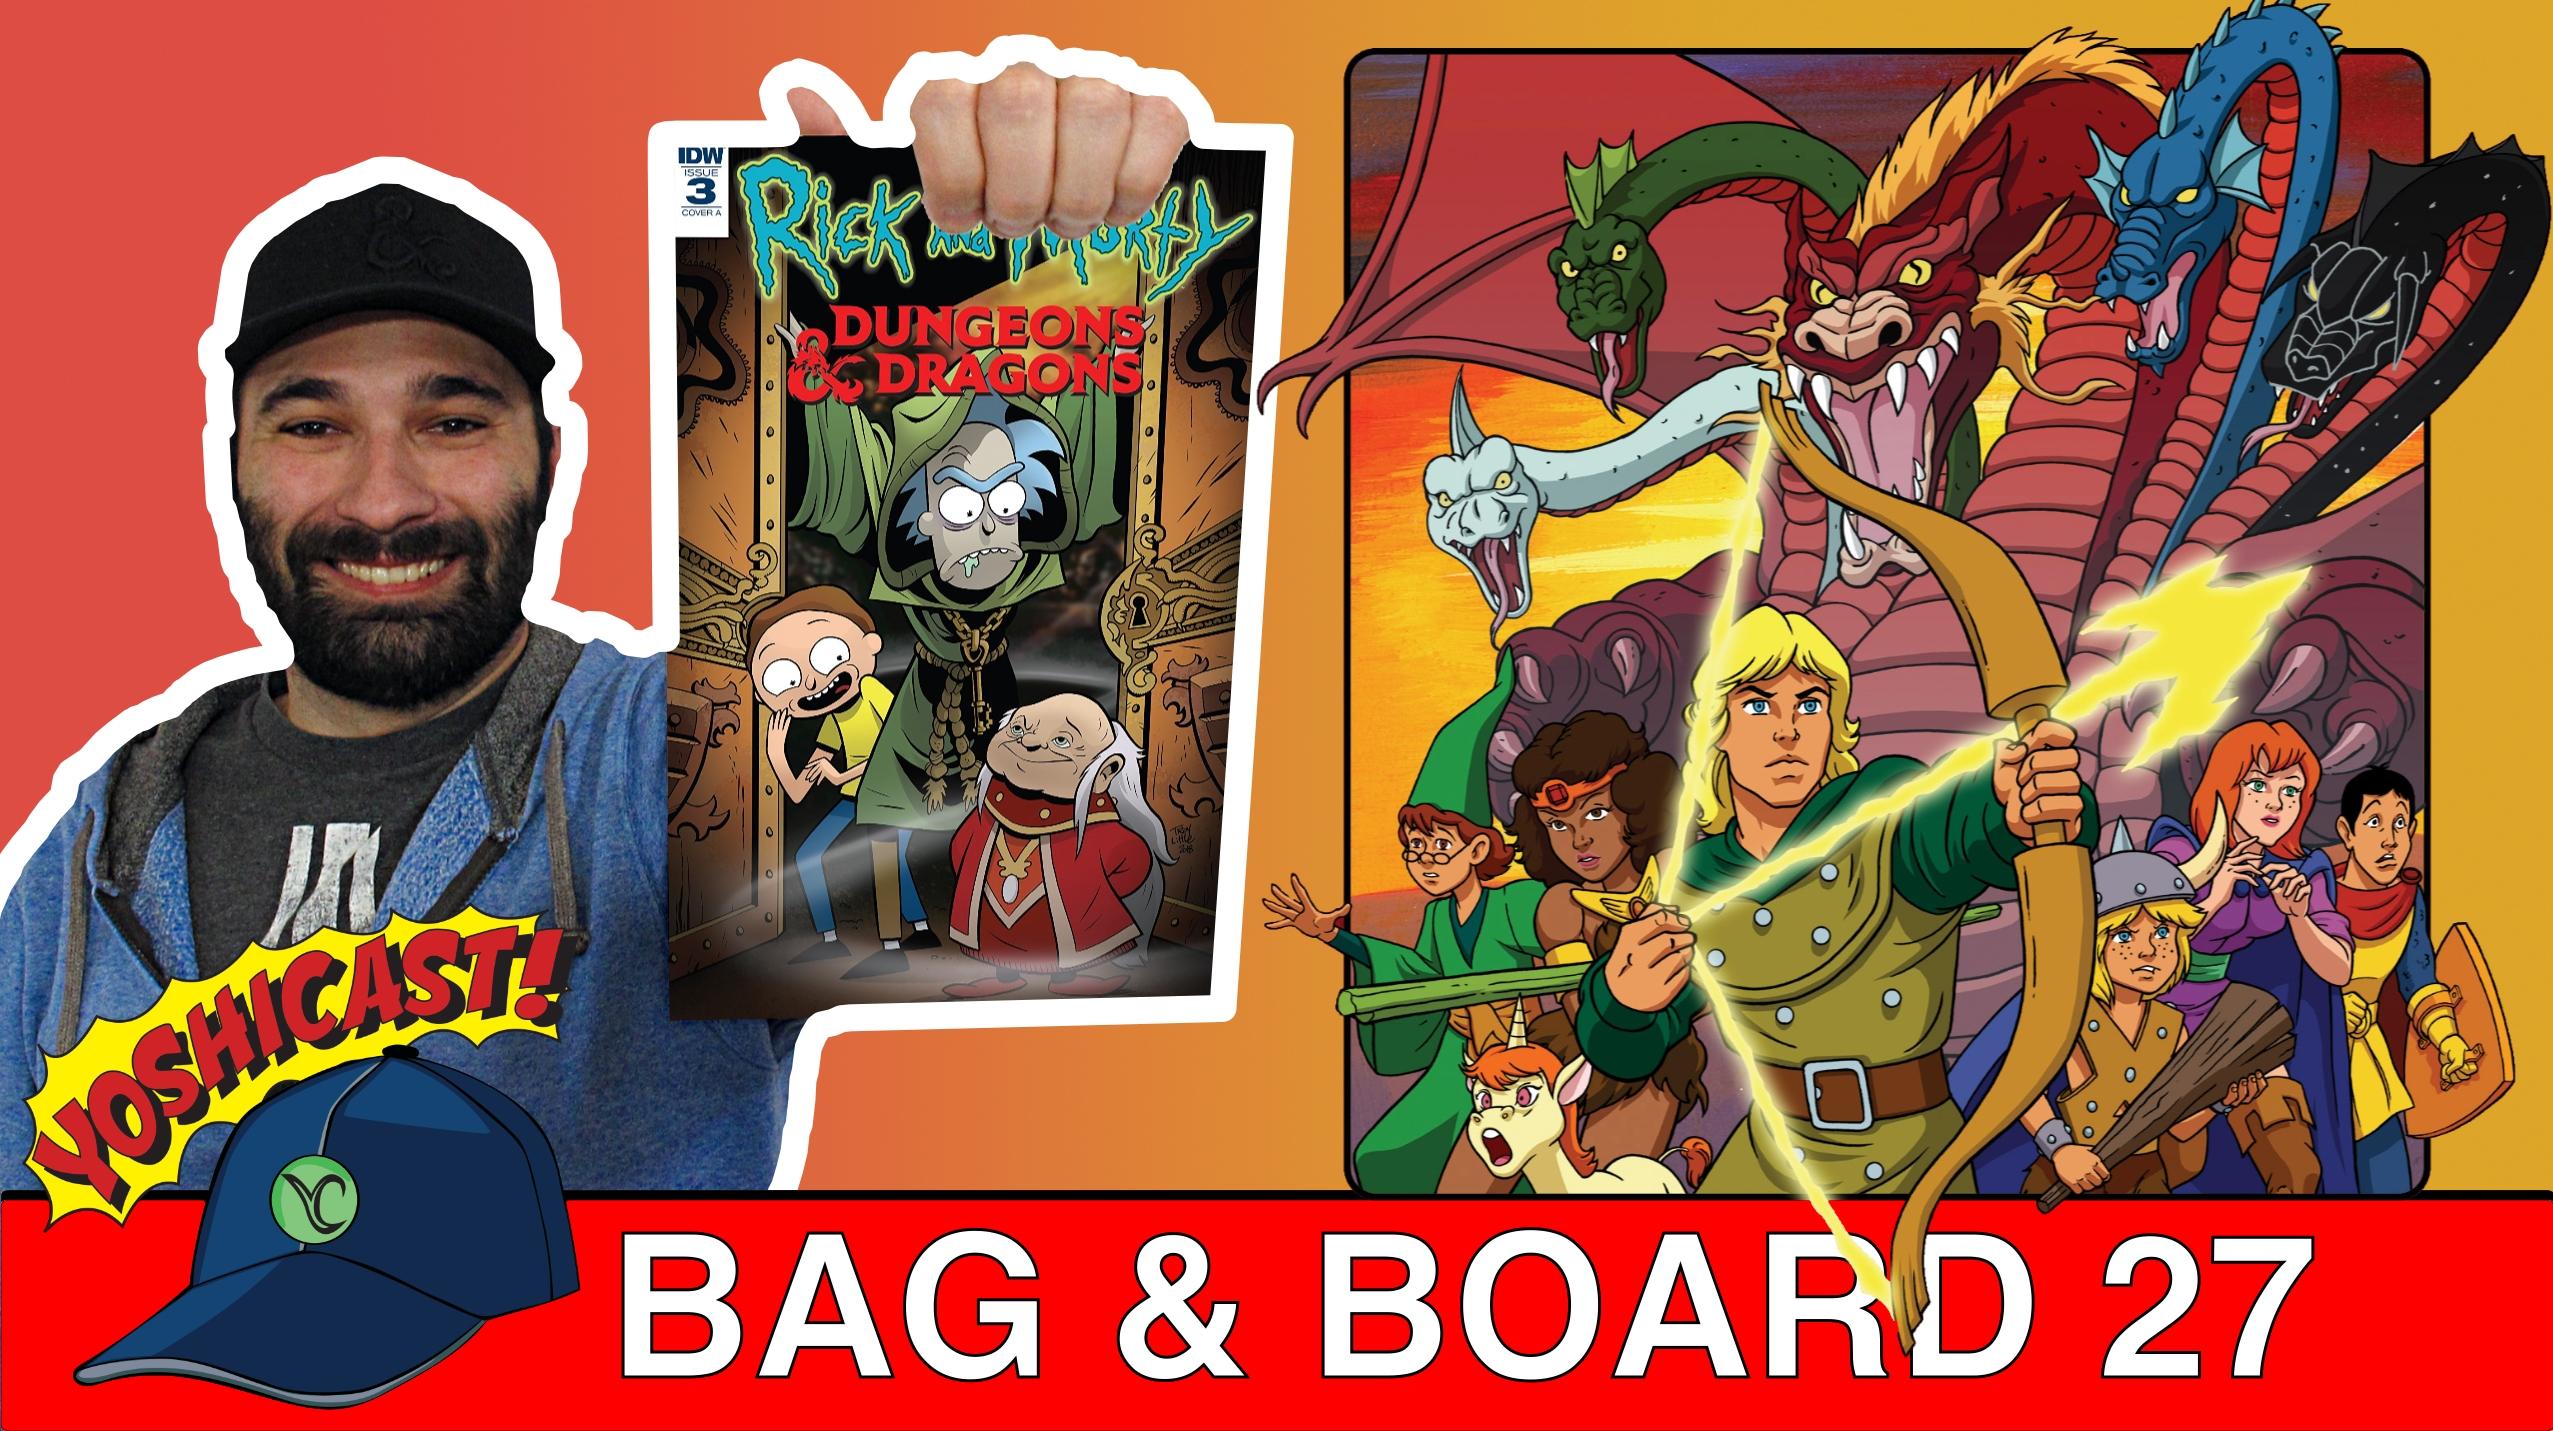 Bag & Board 27 | Rick And Morty Vs Dungeons & Dragons, Shazam, Martian Manhunter, Cosmic Ghost Rider